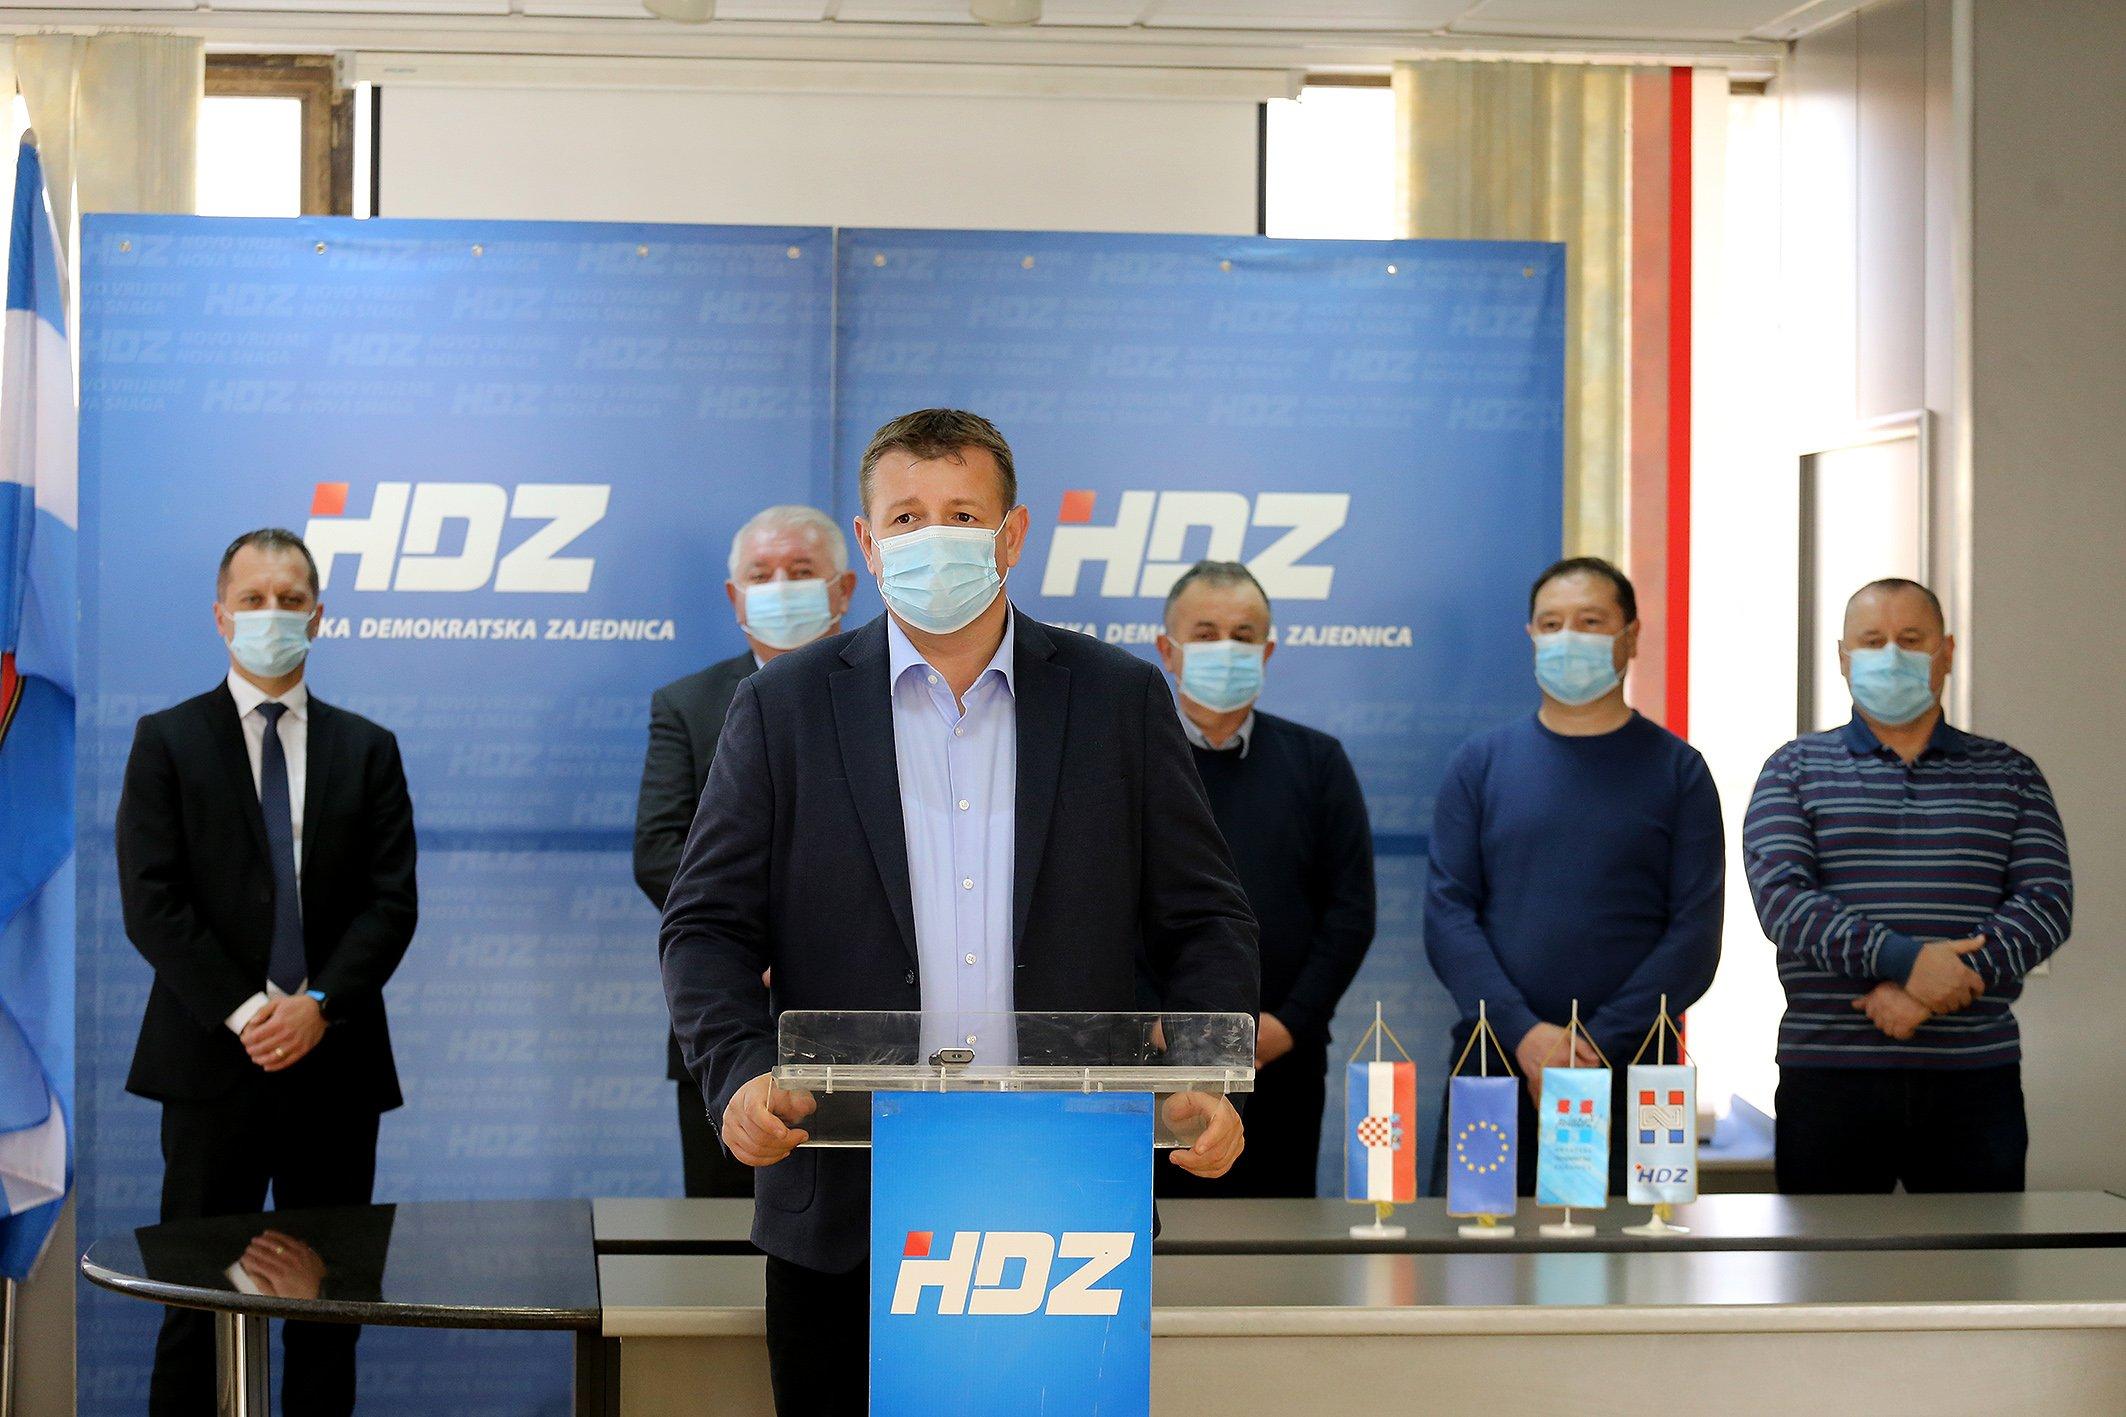 HDZ press (1)